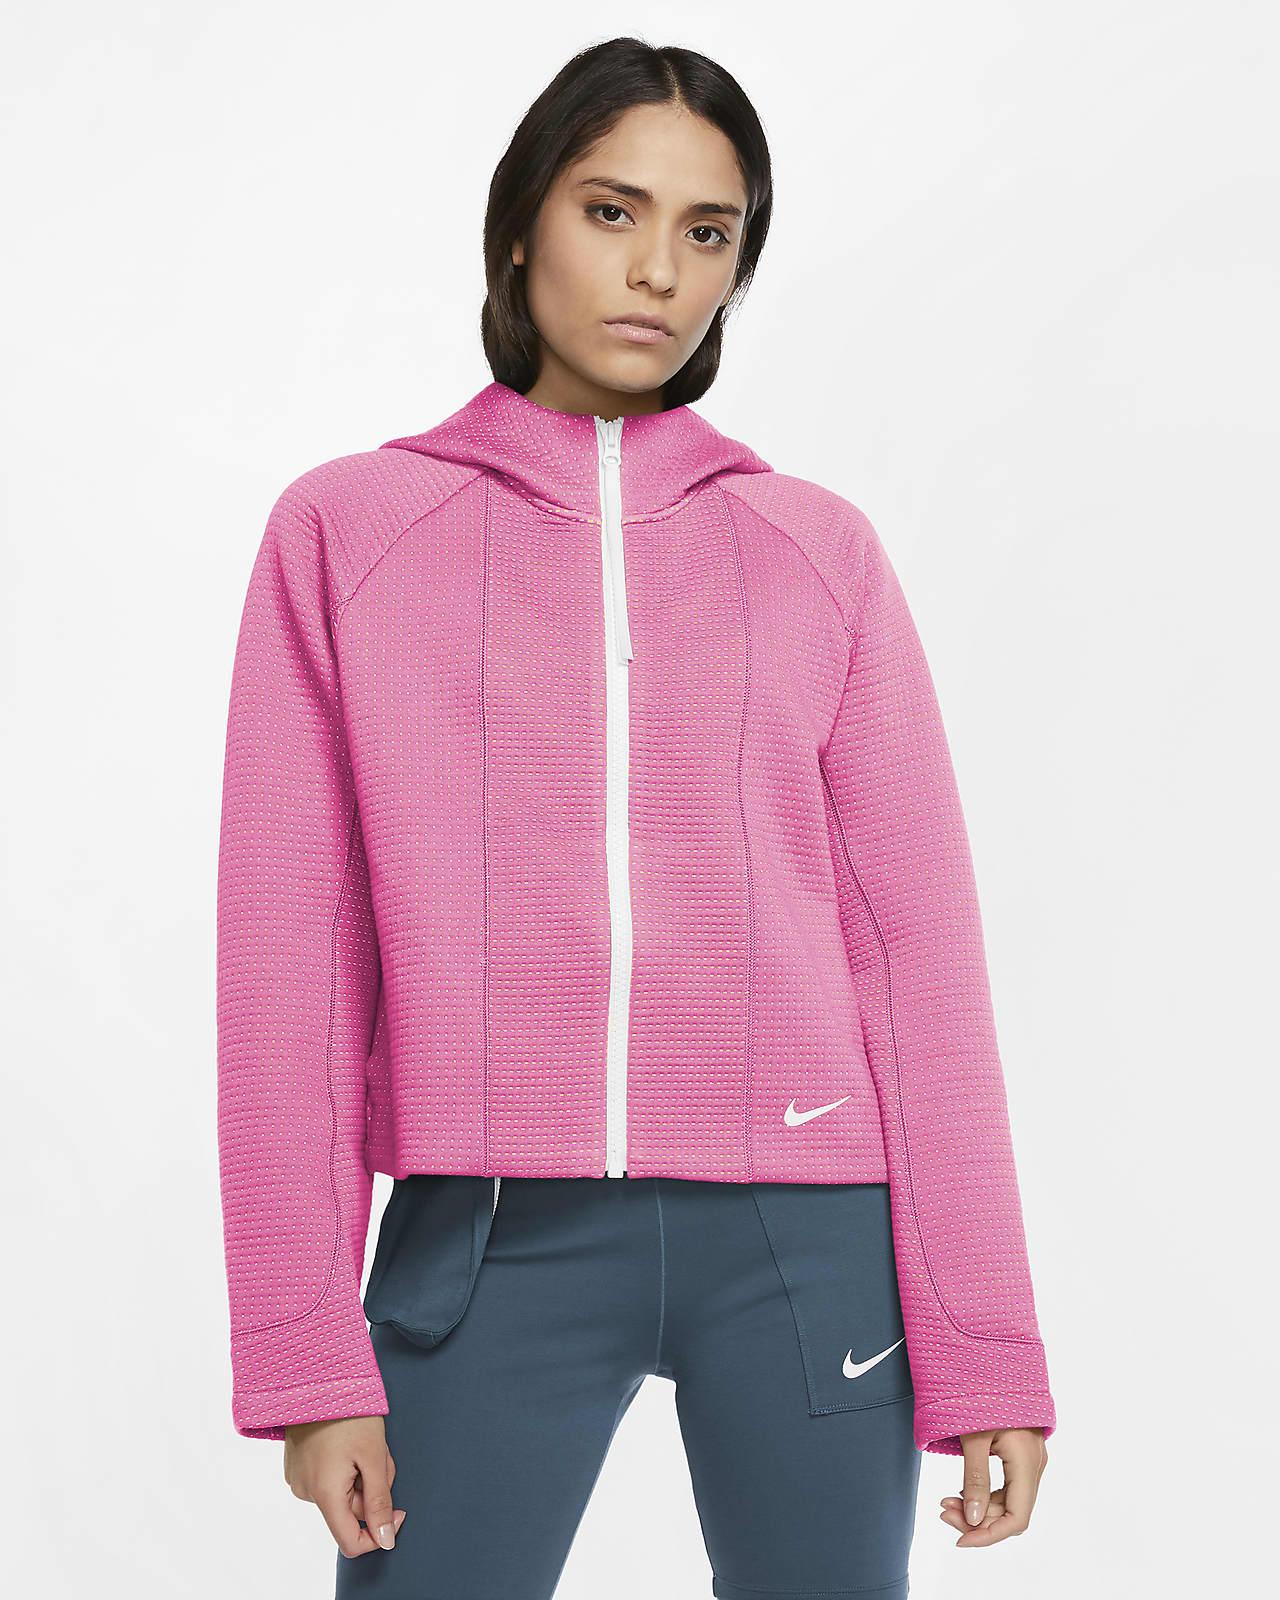 Nike Sportswear Tech Fleece speciális, hosszú cipzáras, kapucnis női pulóver